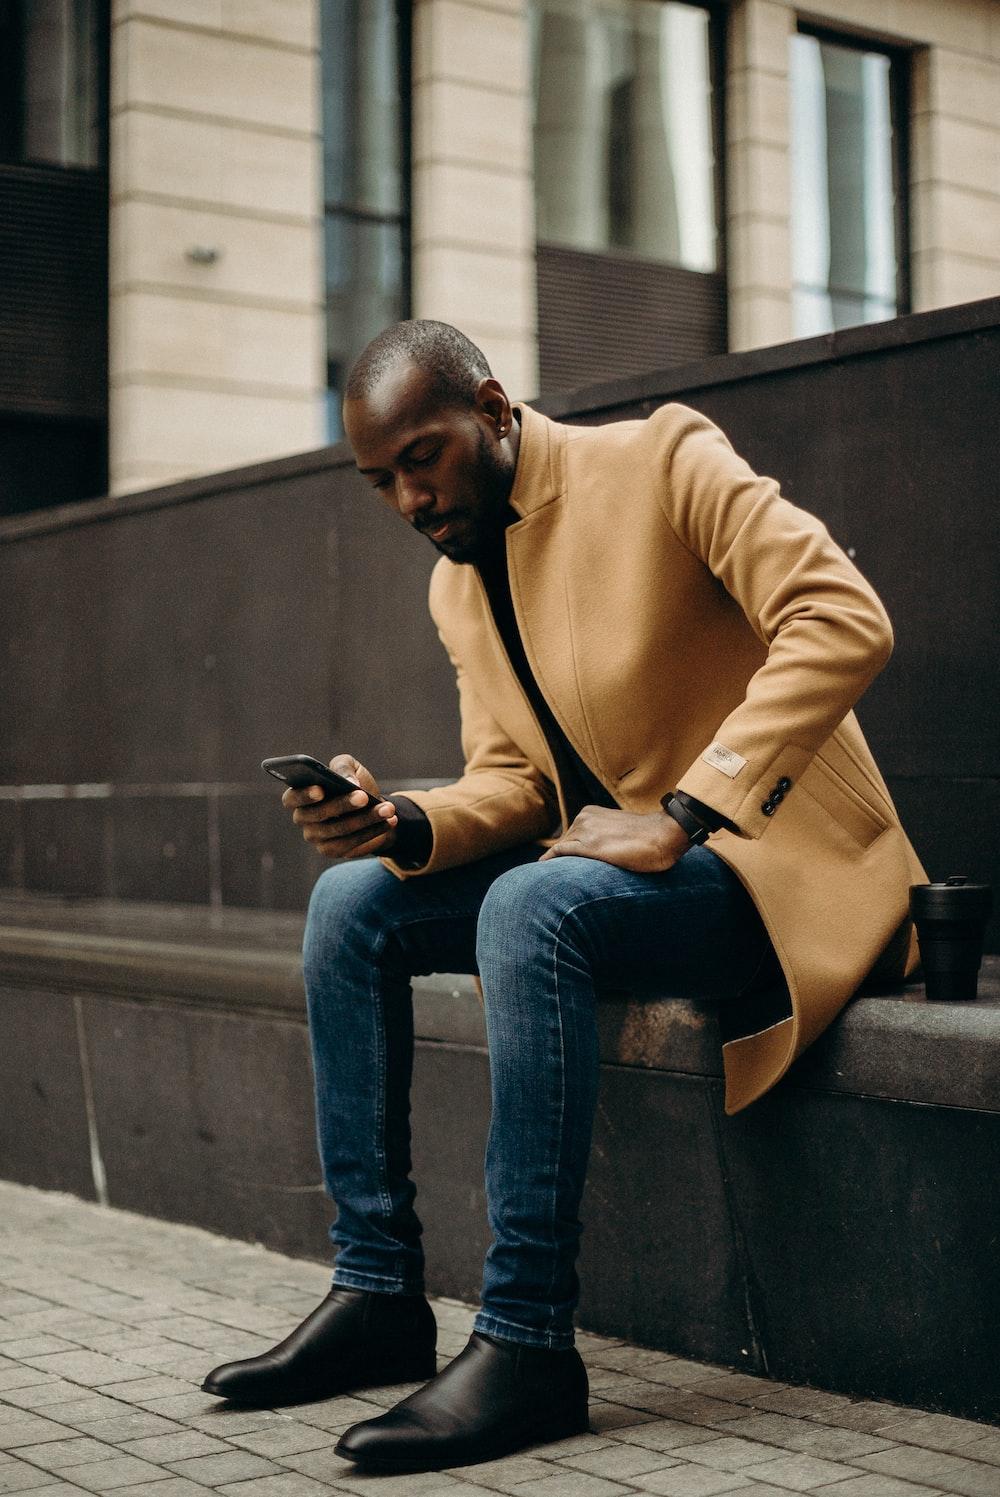 sitting man using smartphone